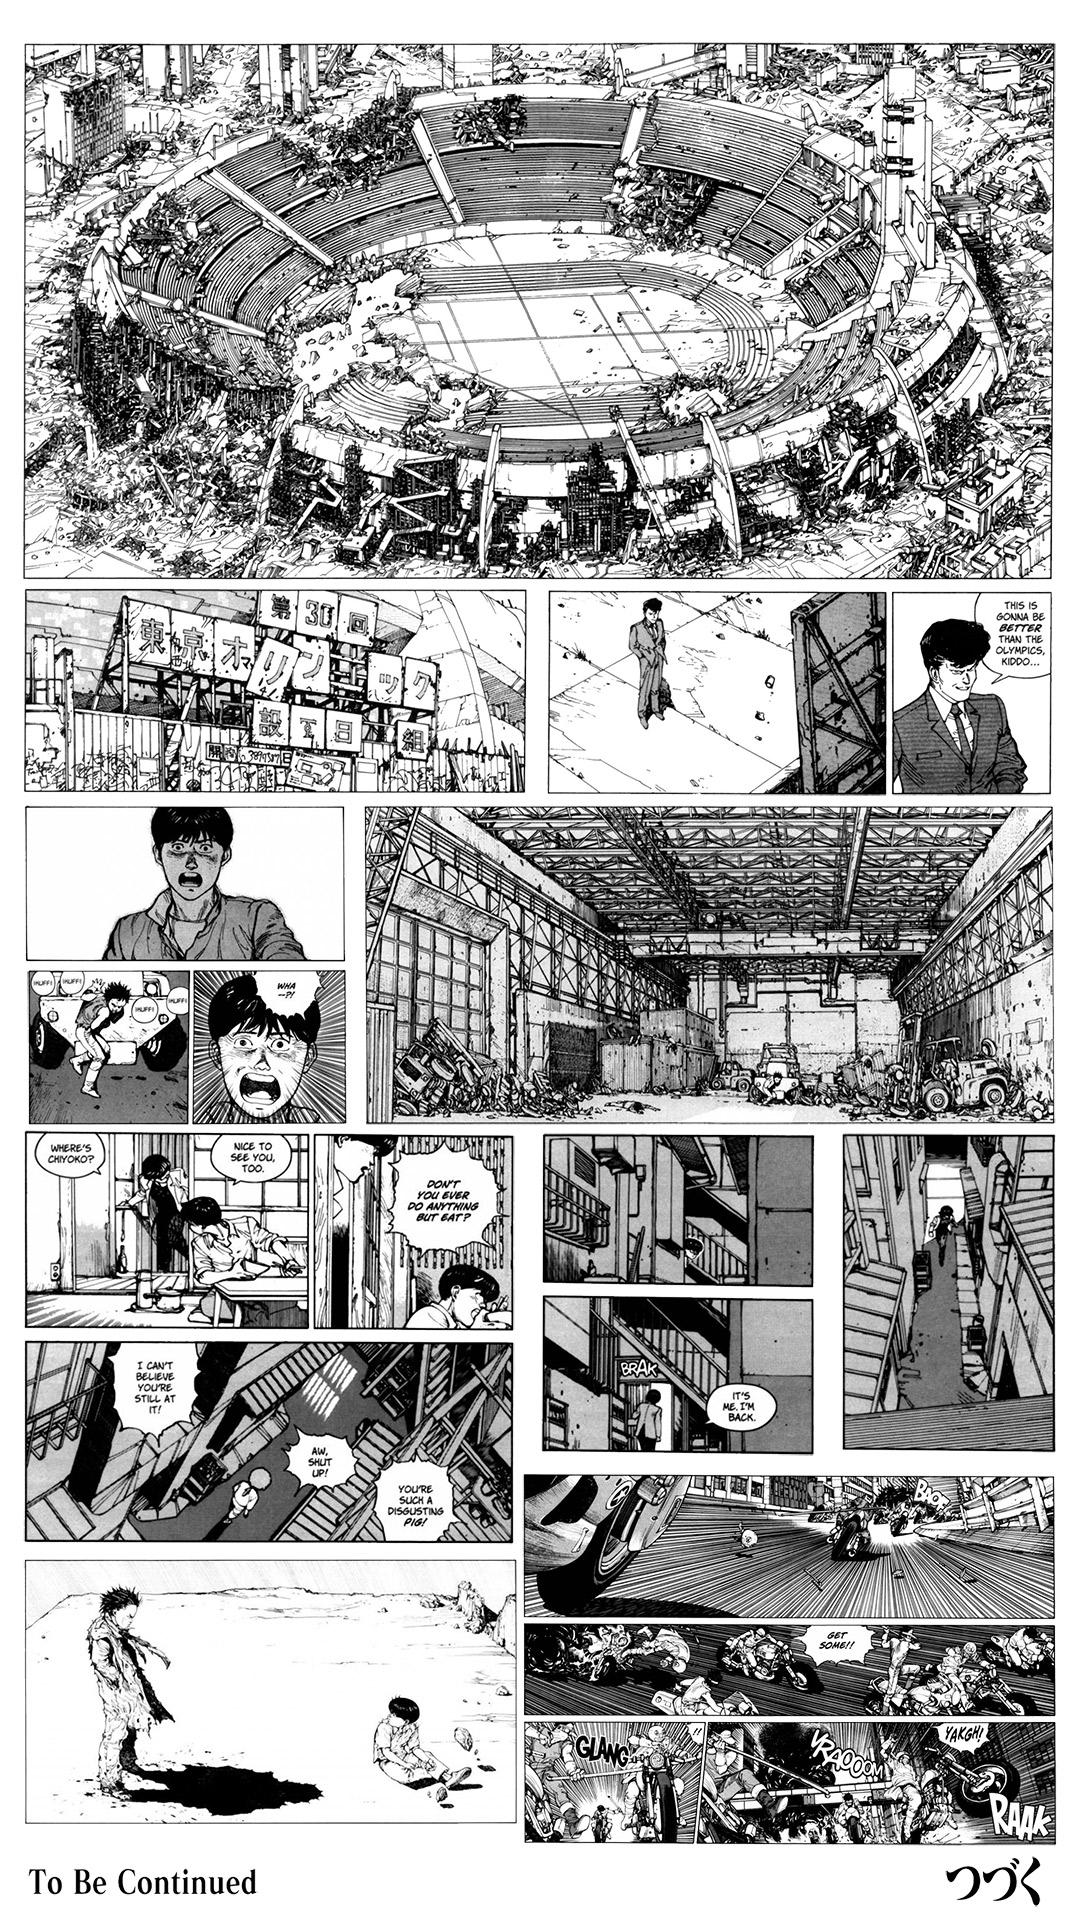 Akira Anime Manga Monochrome